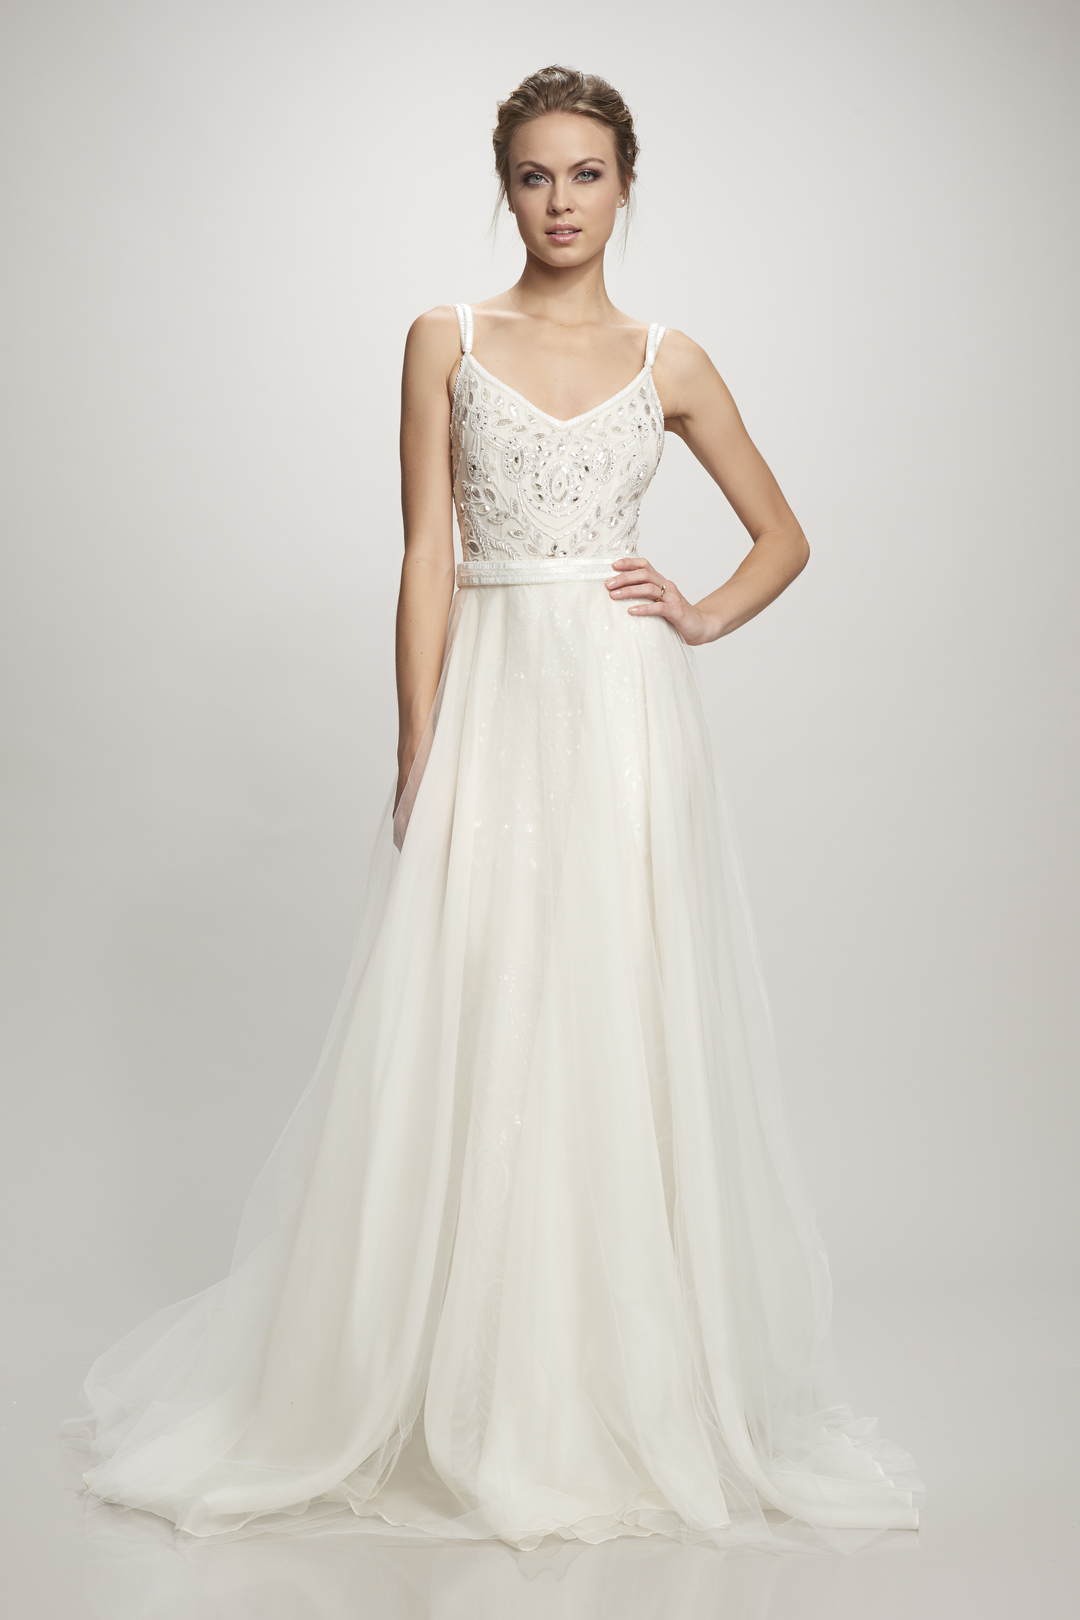 Dress main 2x 1547038680